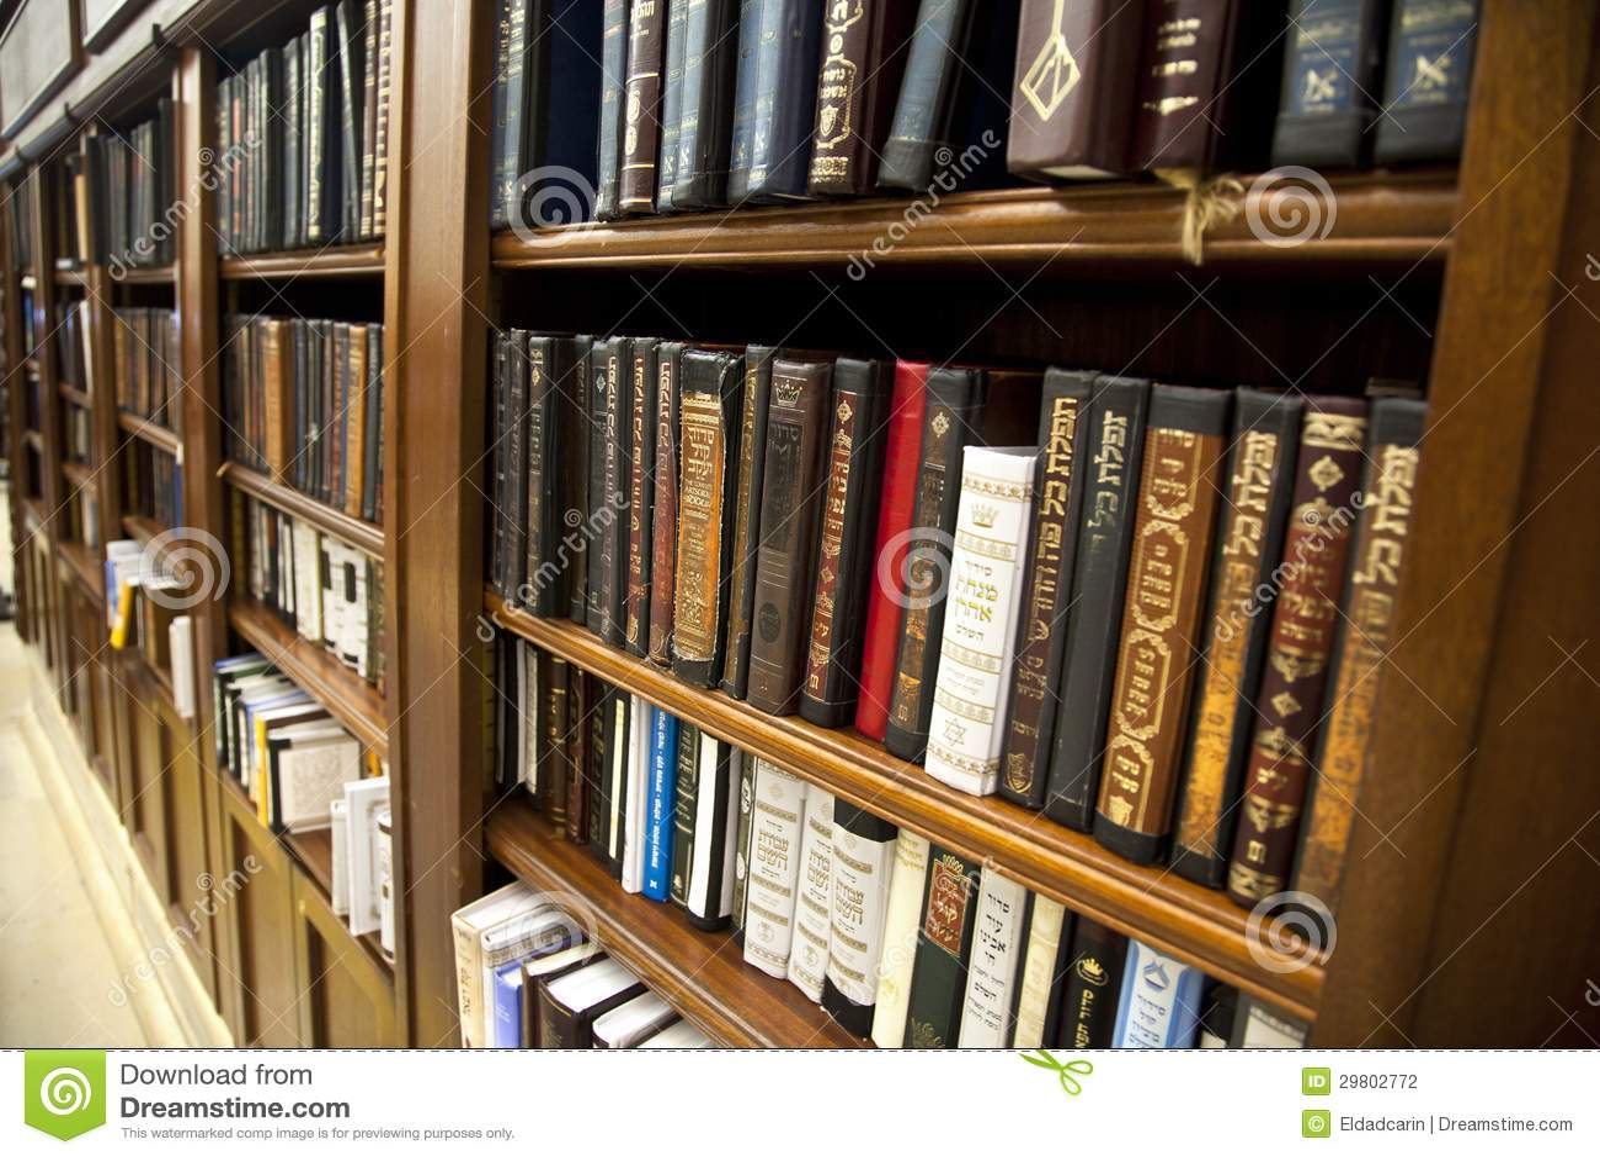 jewish library stock photos - photo #5